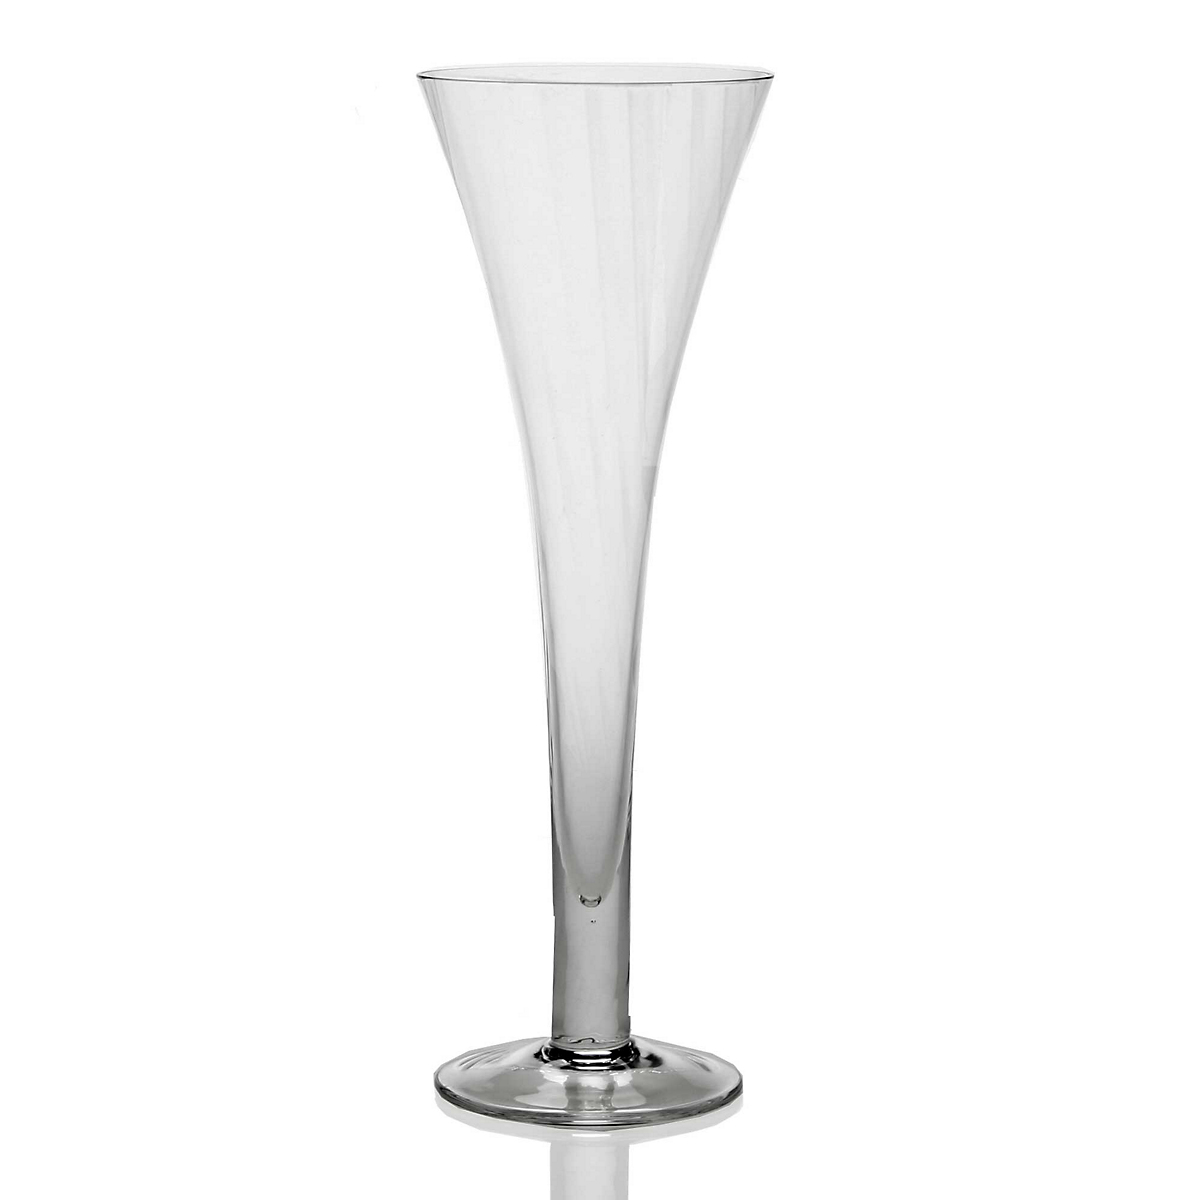 William yeoward corinne champagne flute hollow stem gump 39 s - Champagne flutes hollow stem ...